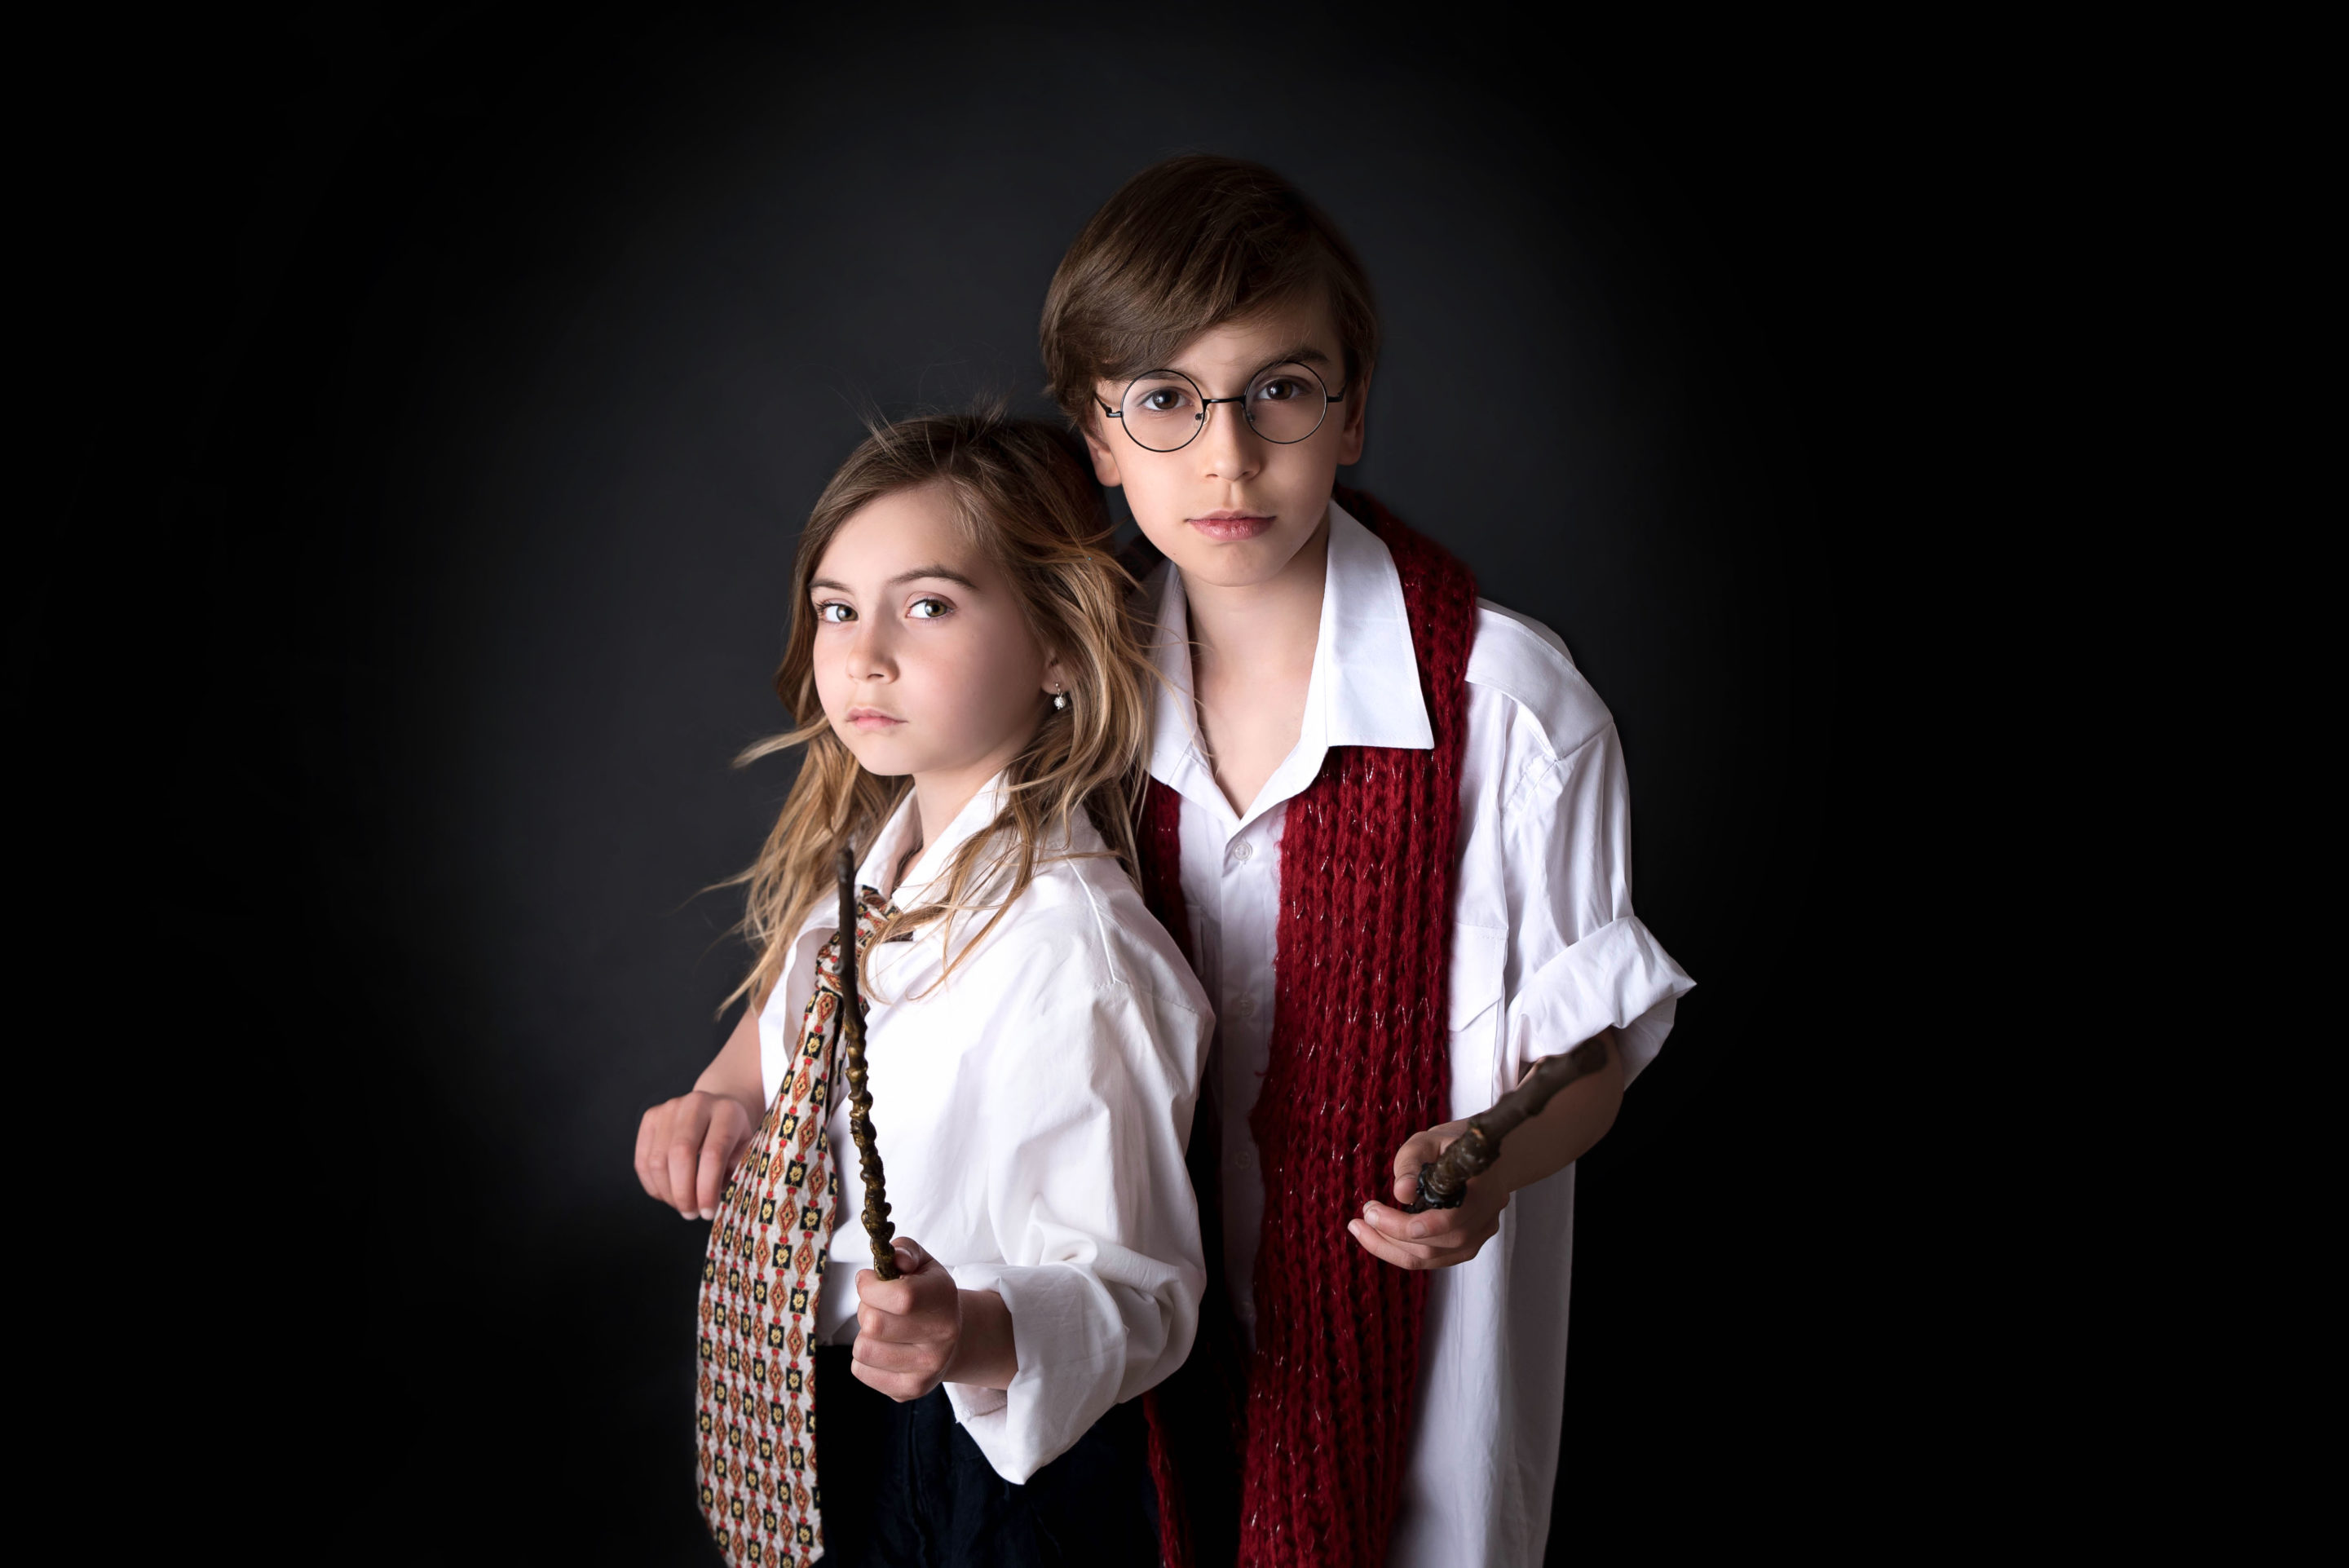 photographe enfant harry potter